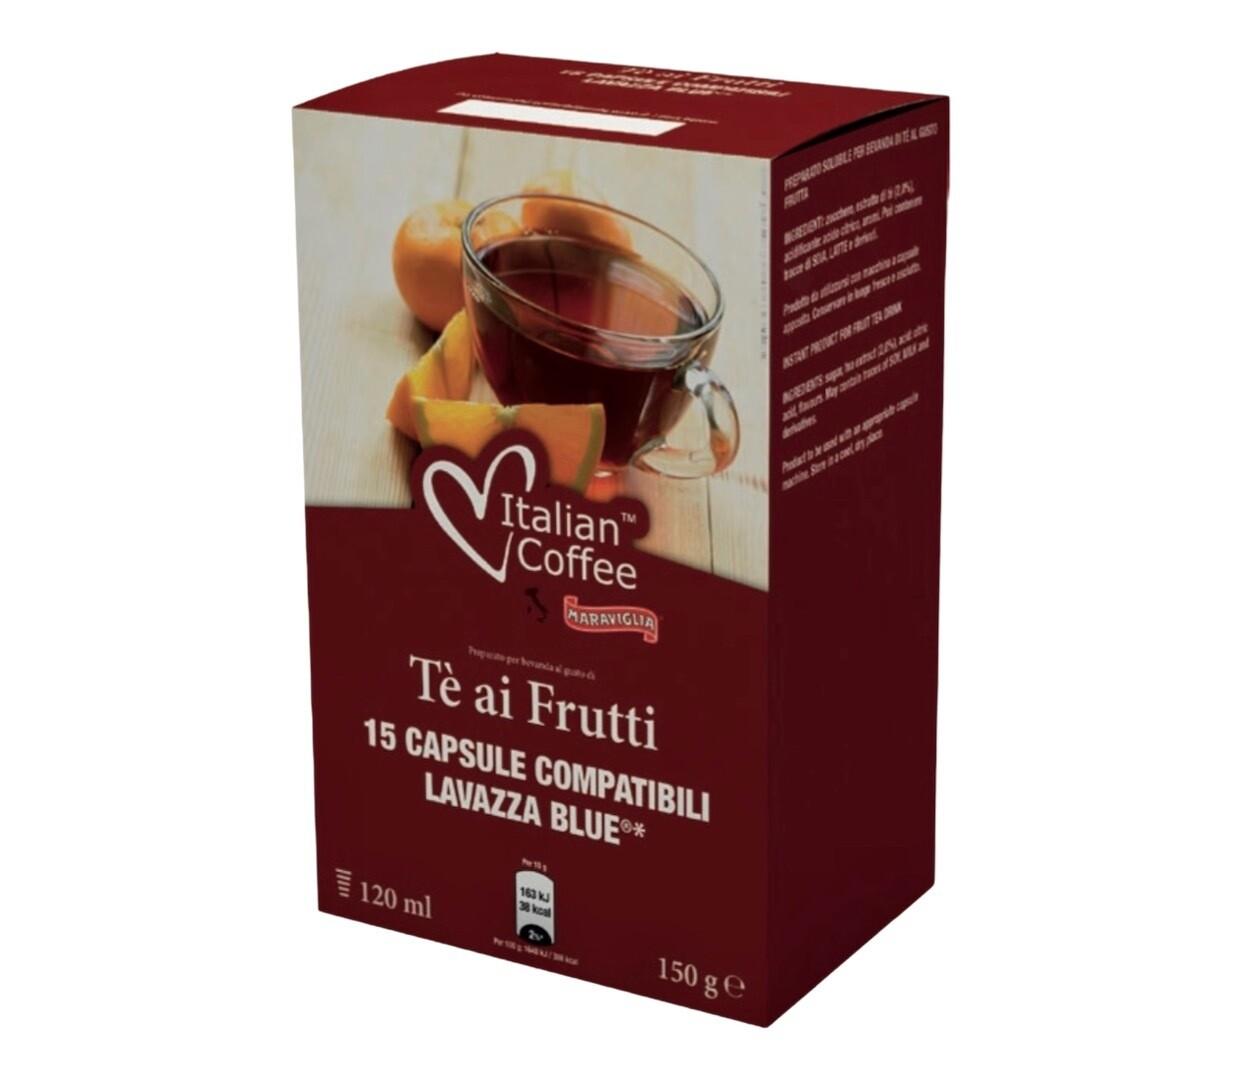 Italian Coffee*comp.Lavazza Blue Forest Fruit Шумски Чај x15 капсули